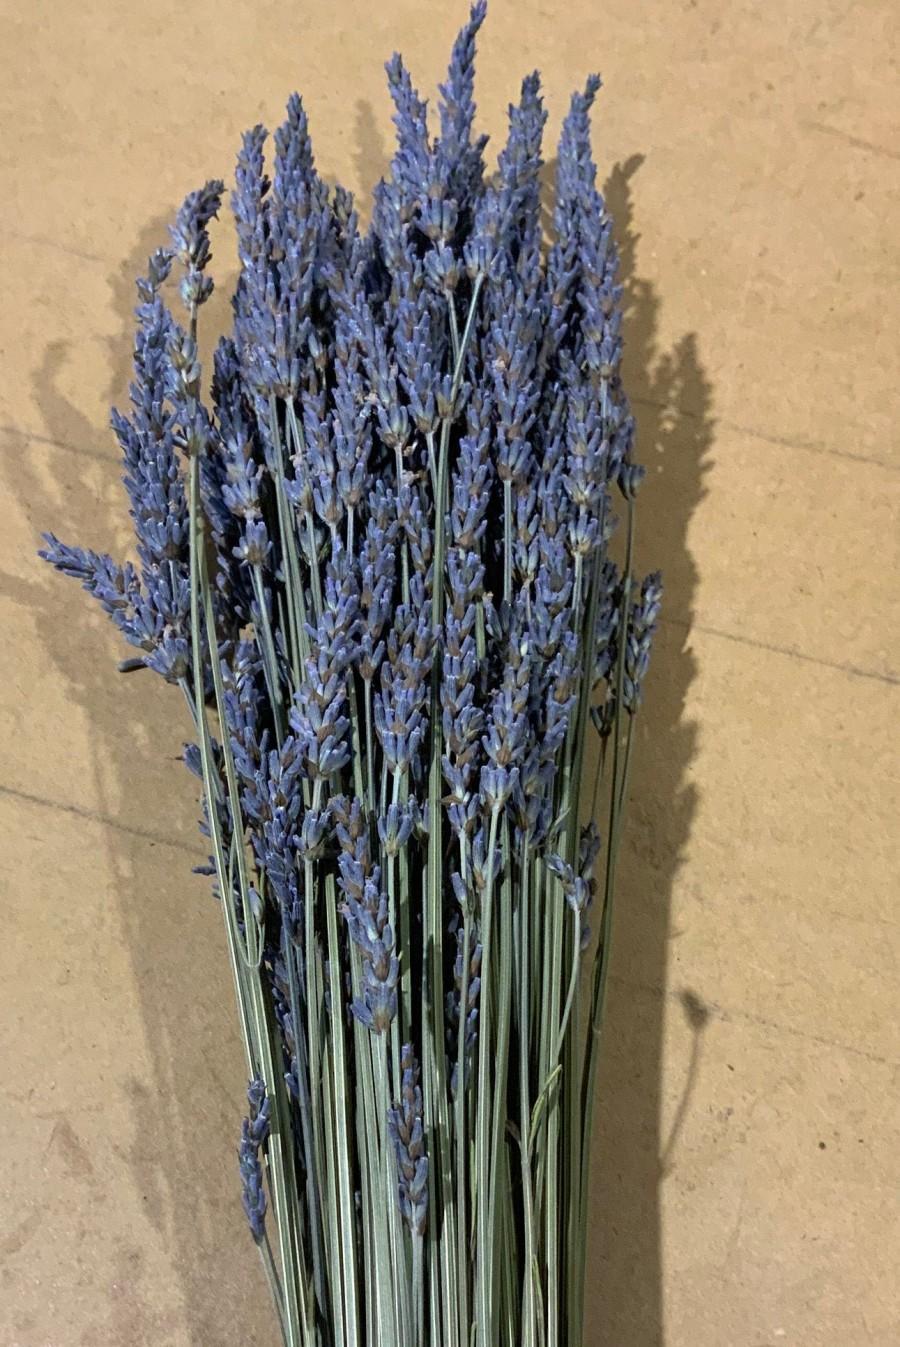 Hochzeit - SALE 2020 Lavender Dried 2.5 oz 1 bunch 200 Stems bundle Grosso English dried lavender bundle best seller weddings